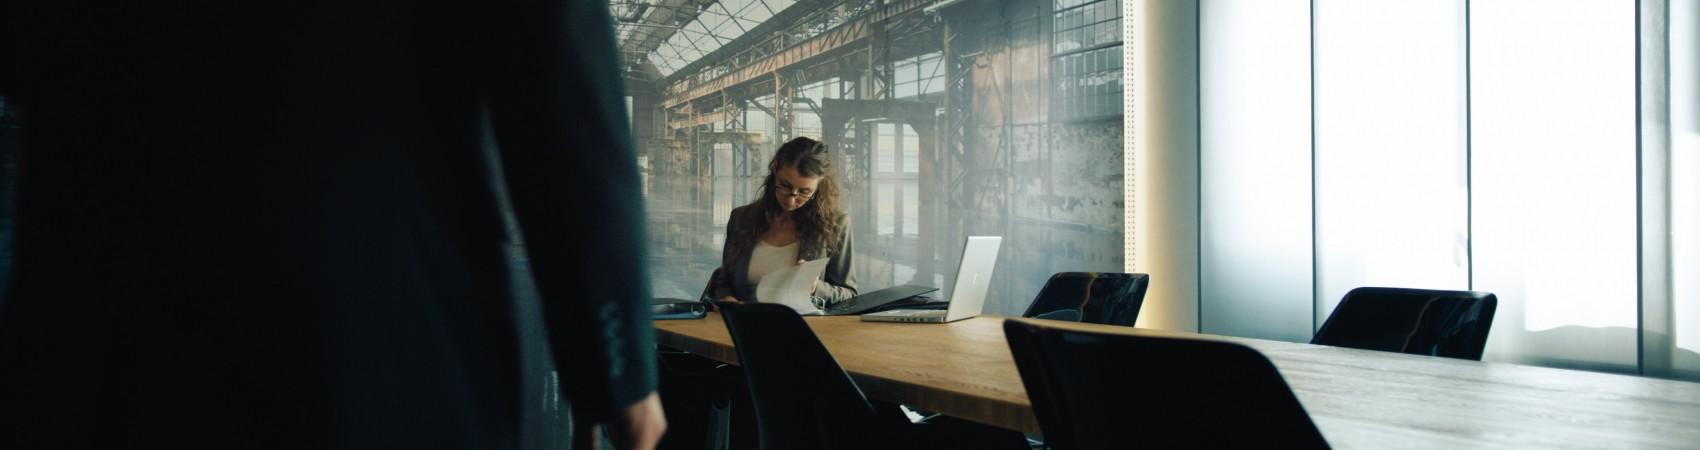 Capturing Light – Episode 21 with Tobias Linden